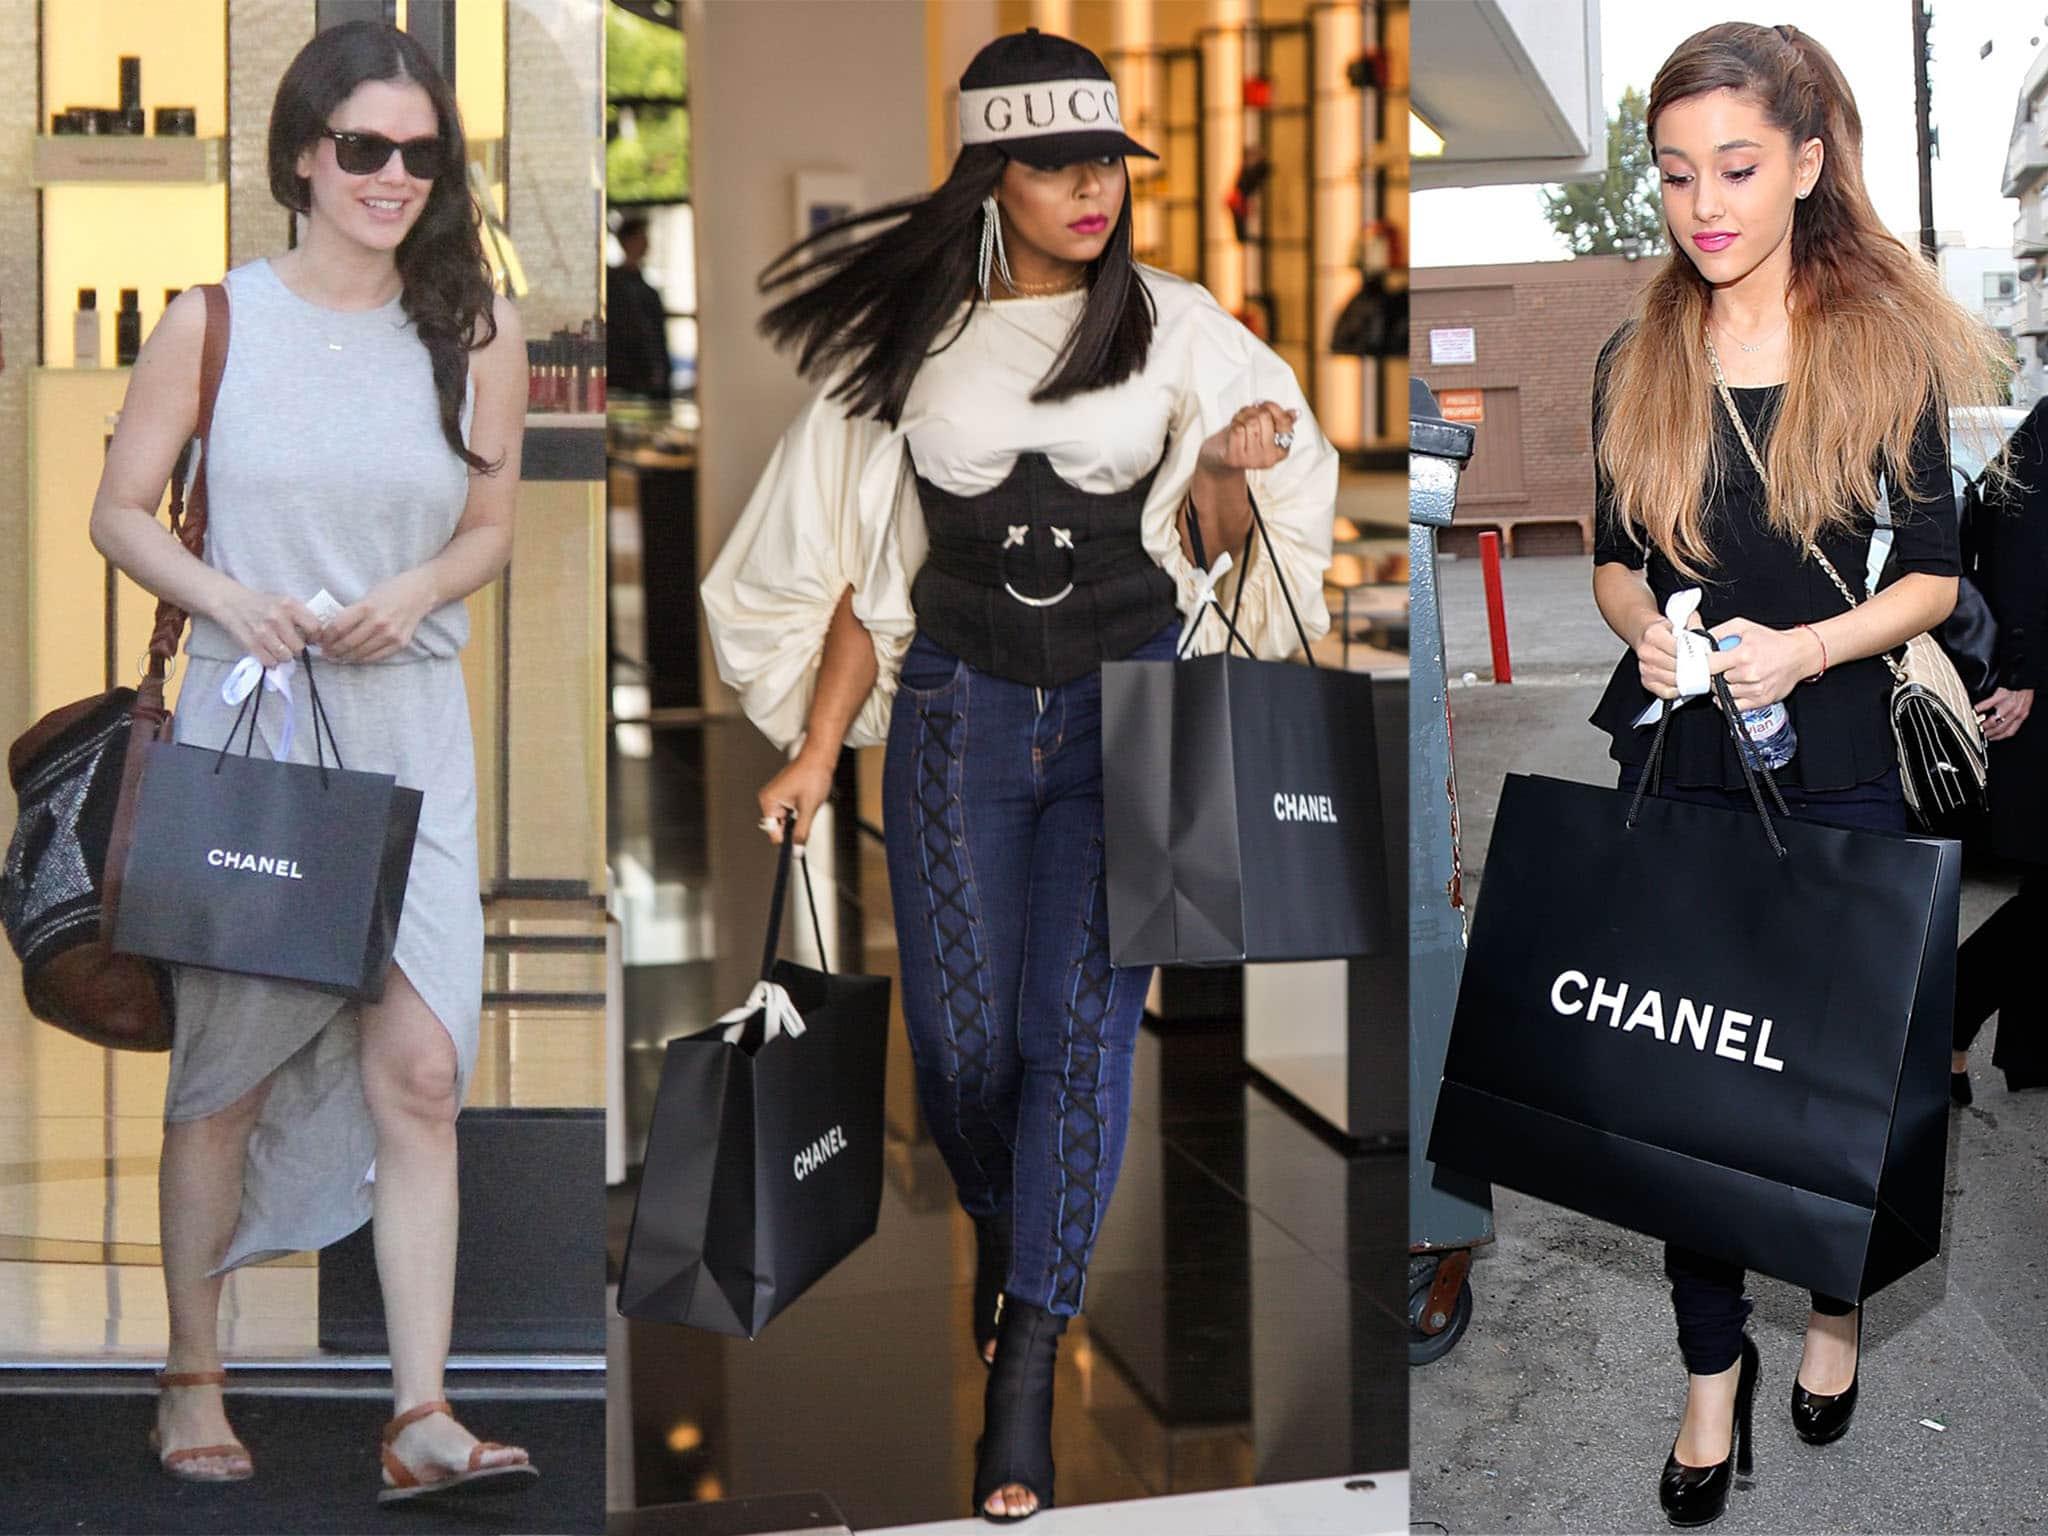 Rachel Bilson, Ashanti, and Ariana Grande shopping at Chanel stores in Los Angeles